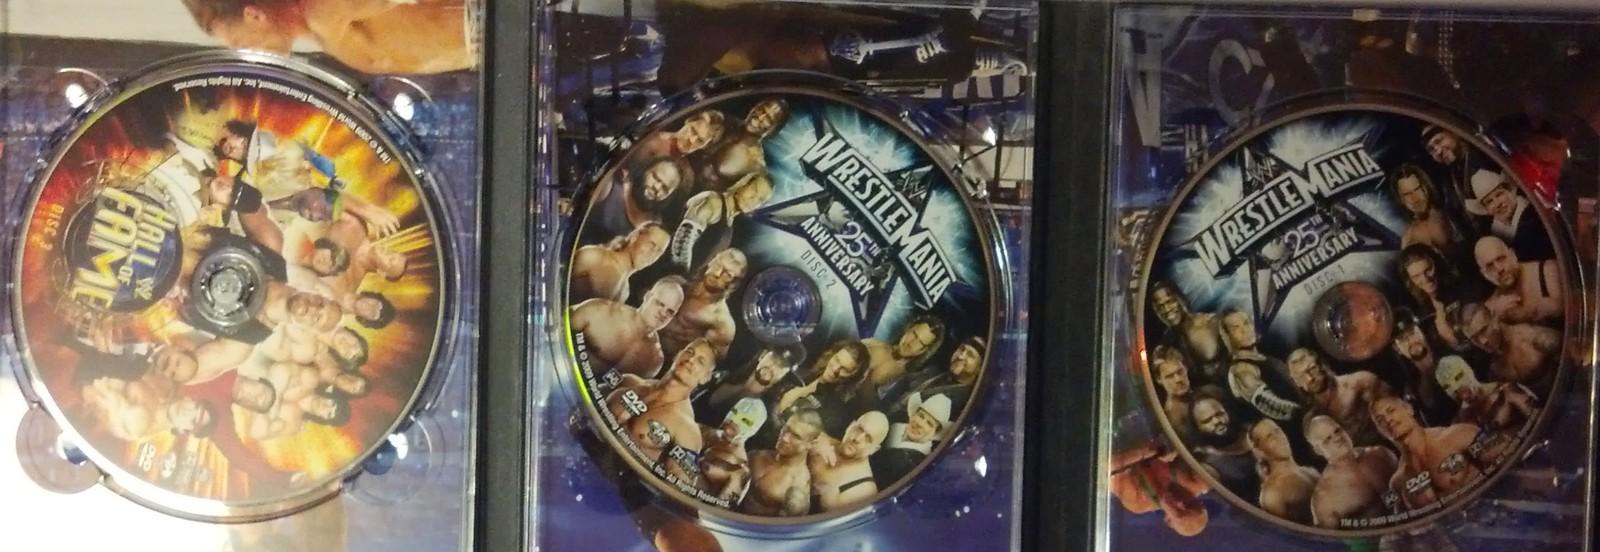 Wrestlemania 25th Anniversary - 3 DVD set